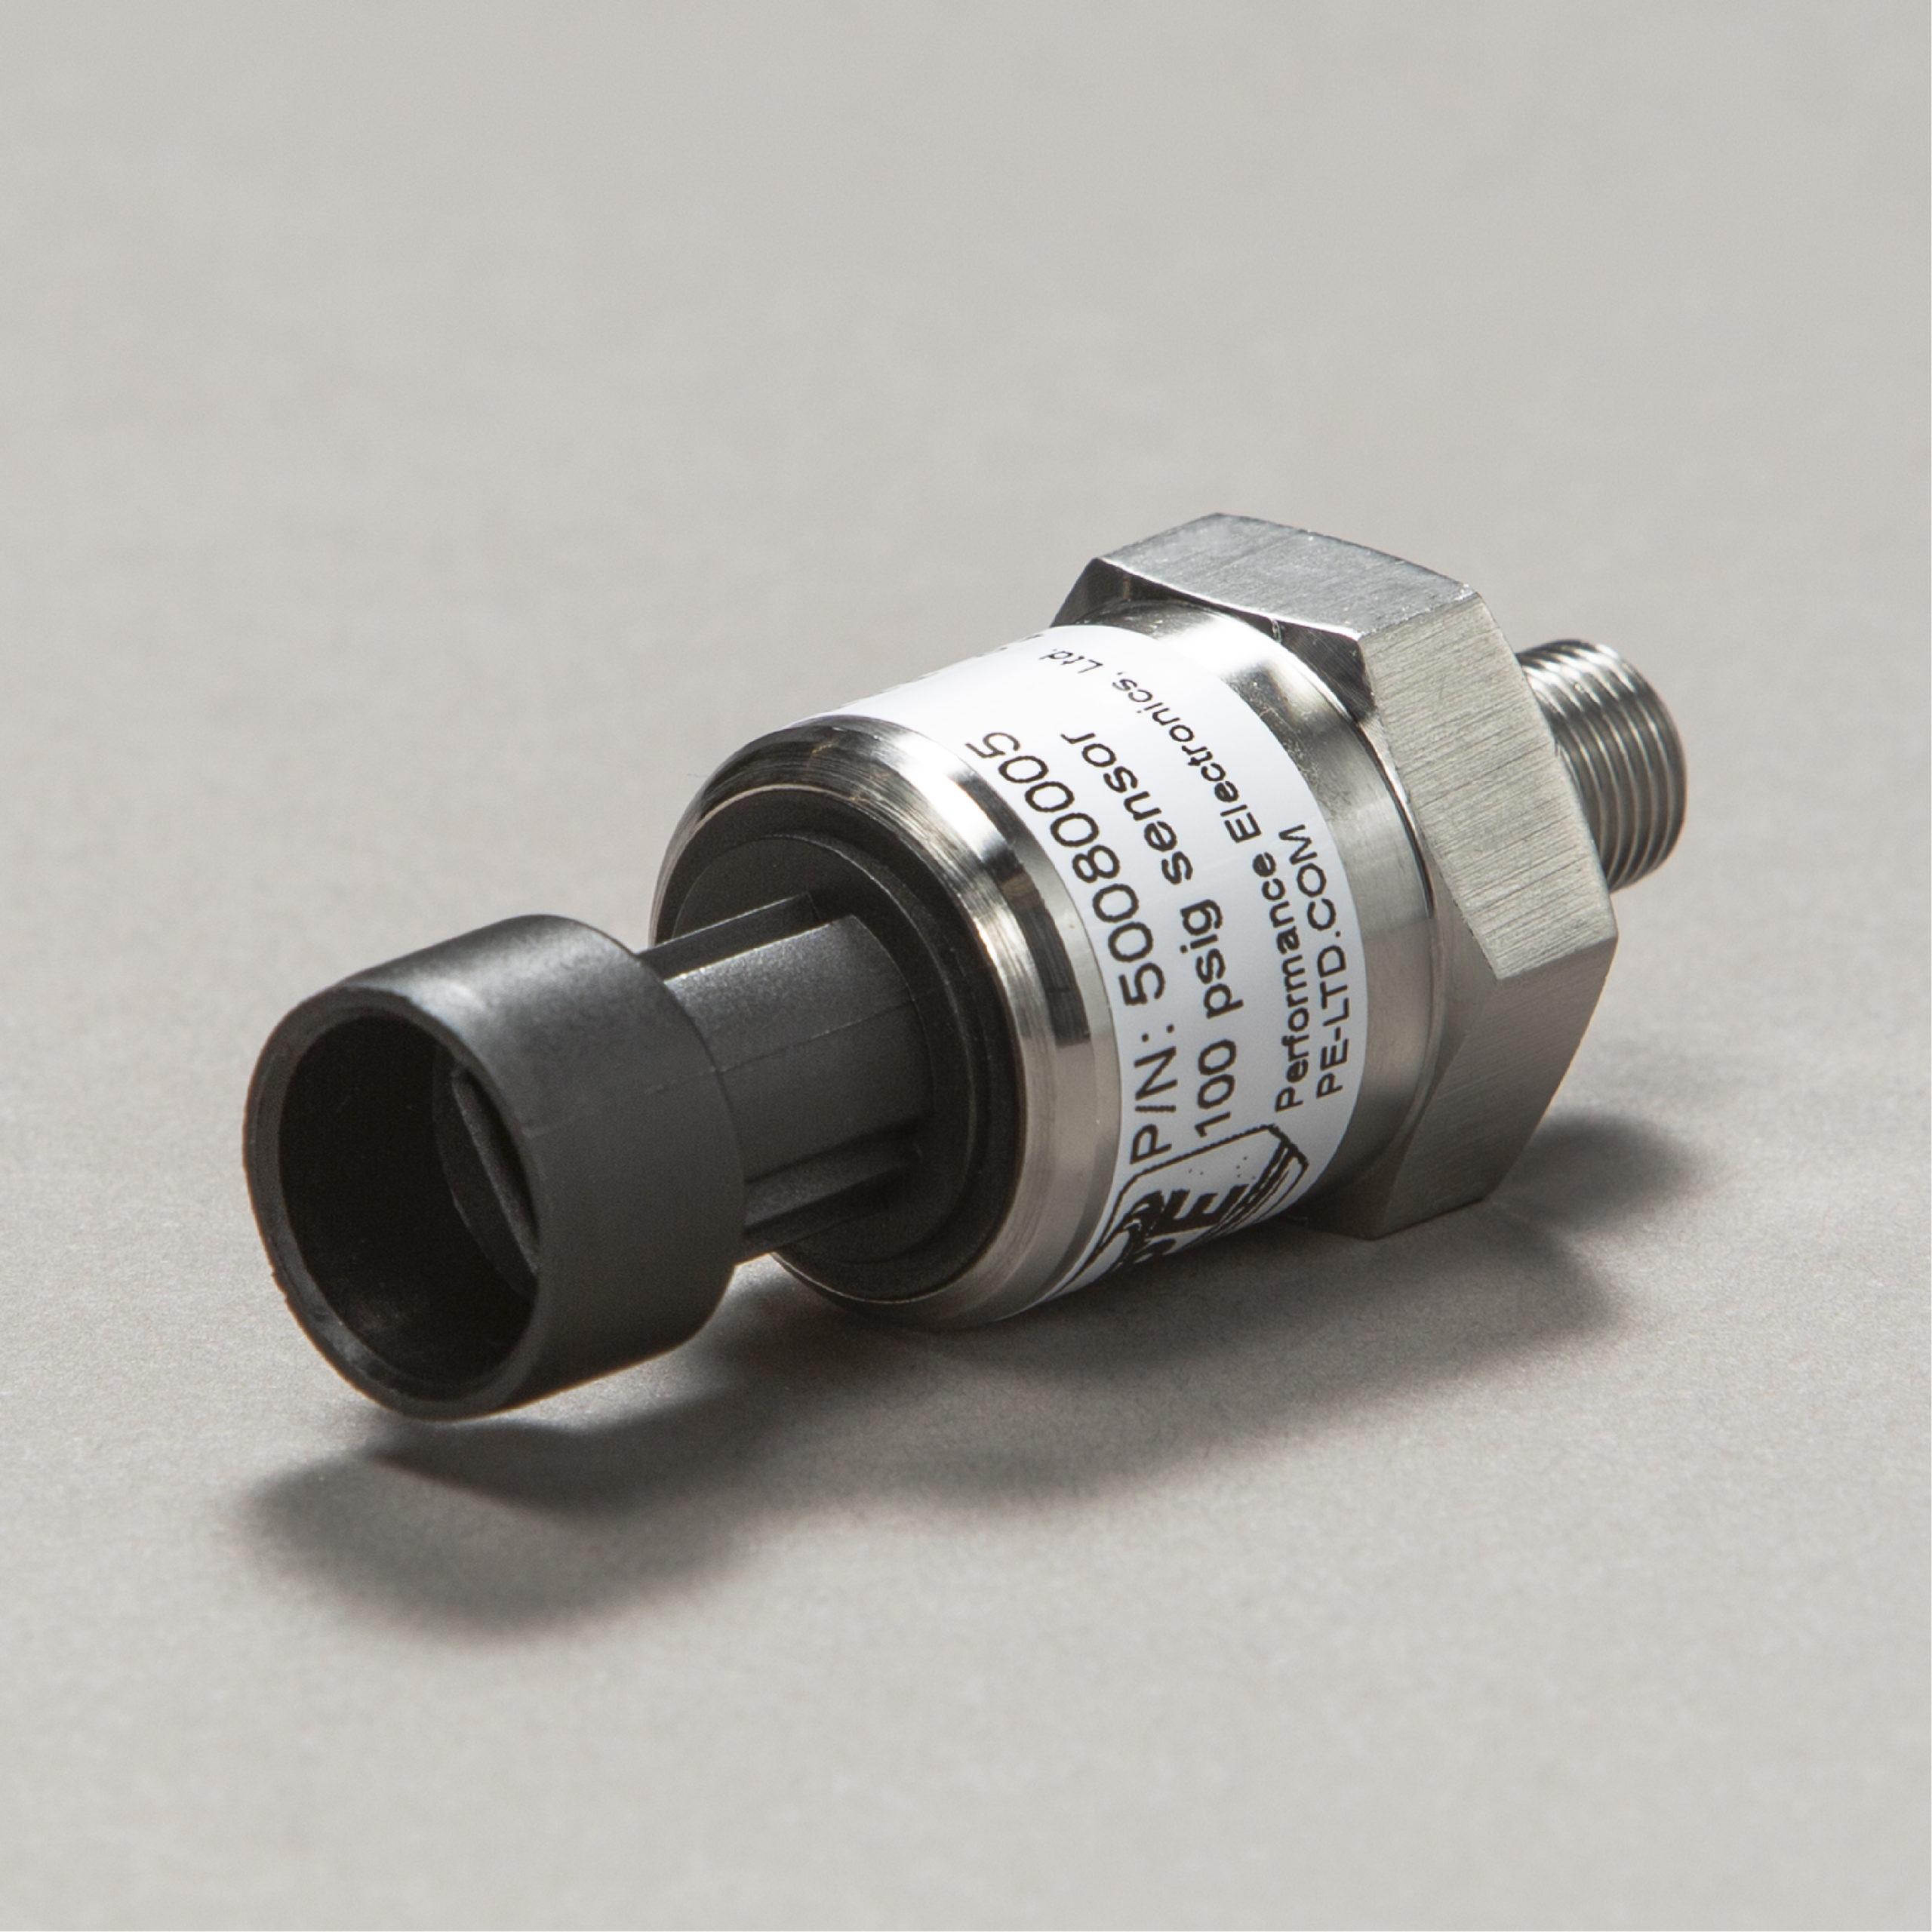 Pressure Transducer 0 to 100 PSI